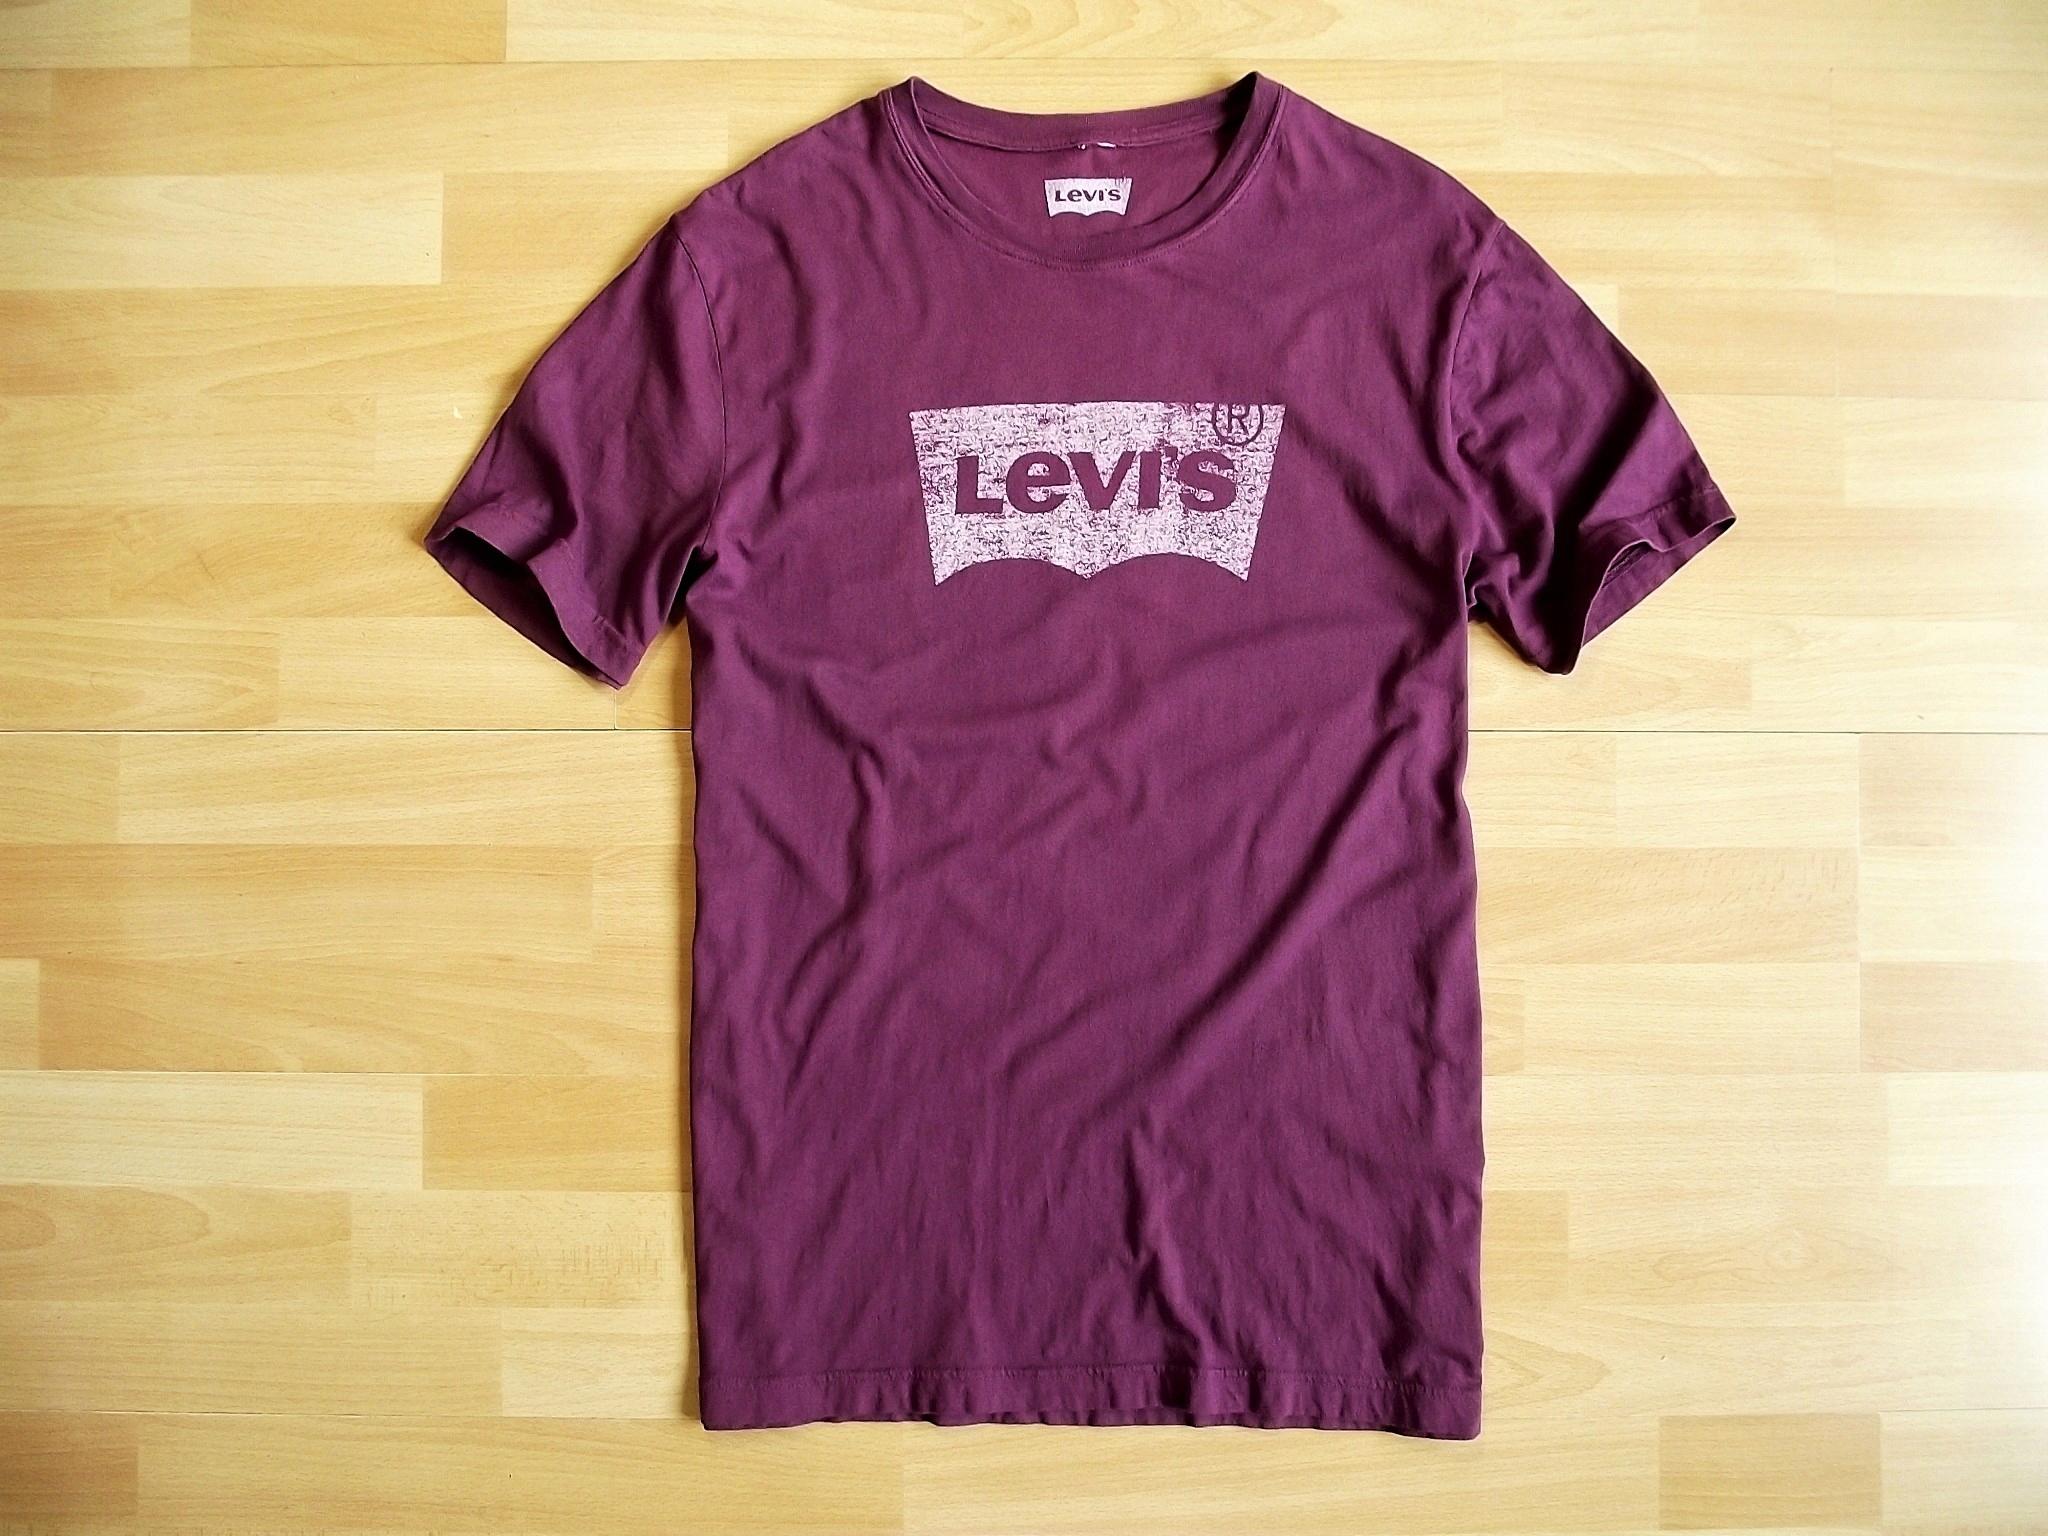 Levi's LEVIS koszulka t-shirt M/L